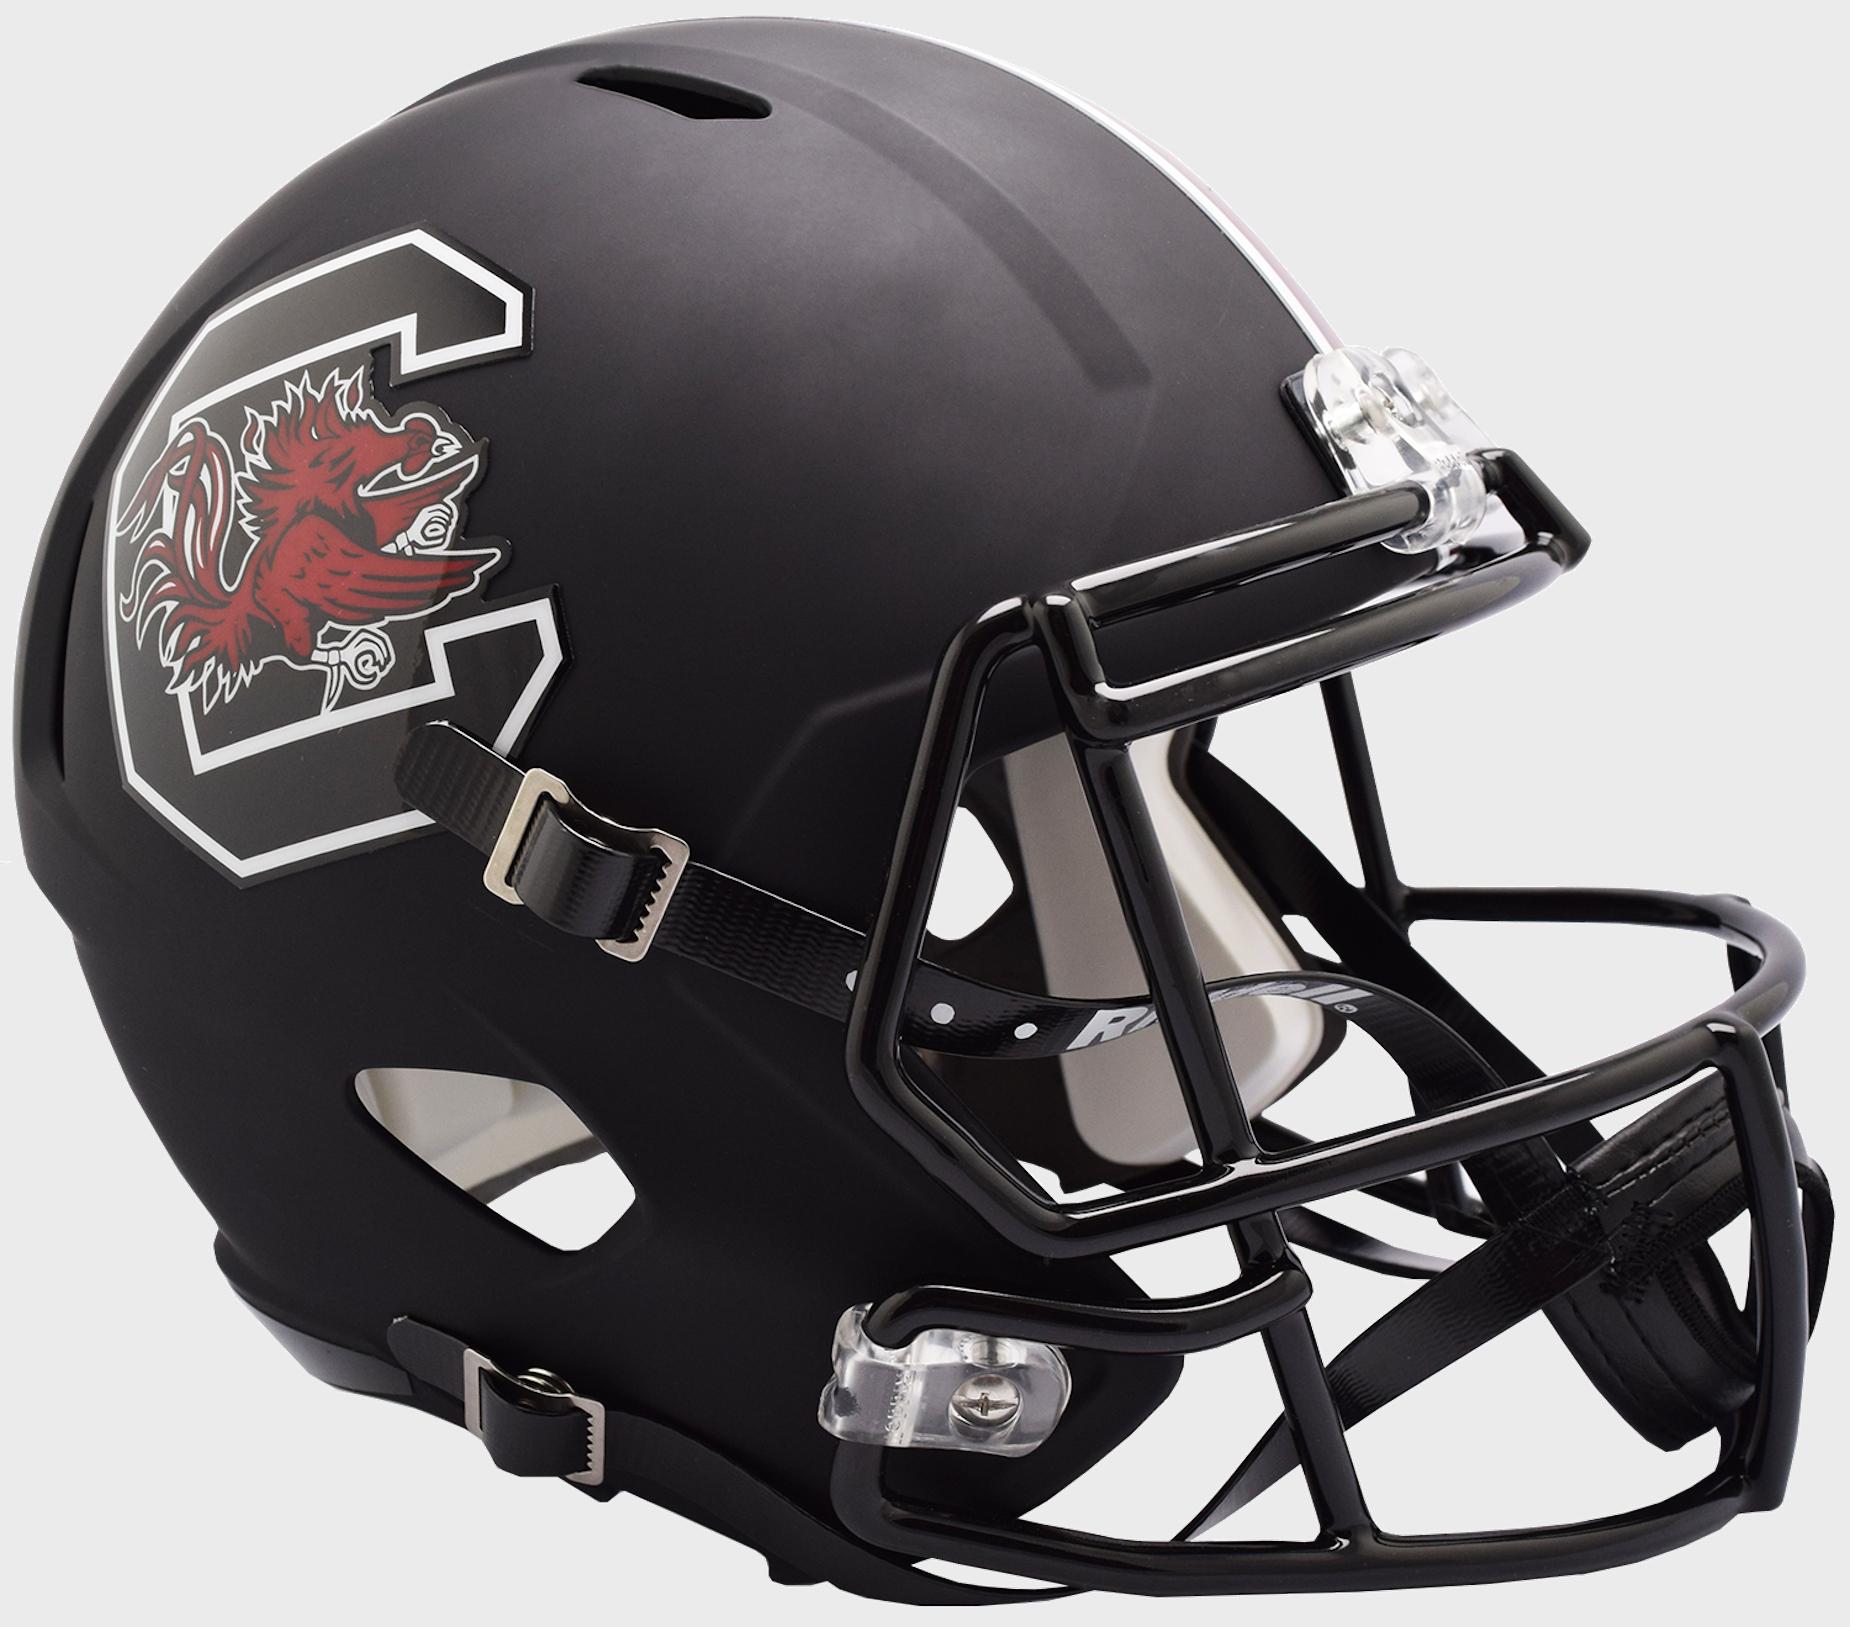 South Carolina Gamecocks Speed Replica Football Helmet <B>Matte Black</B>